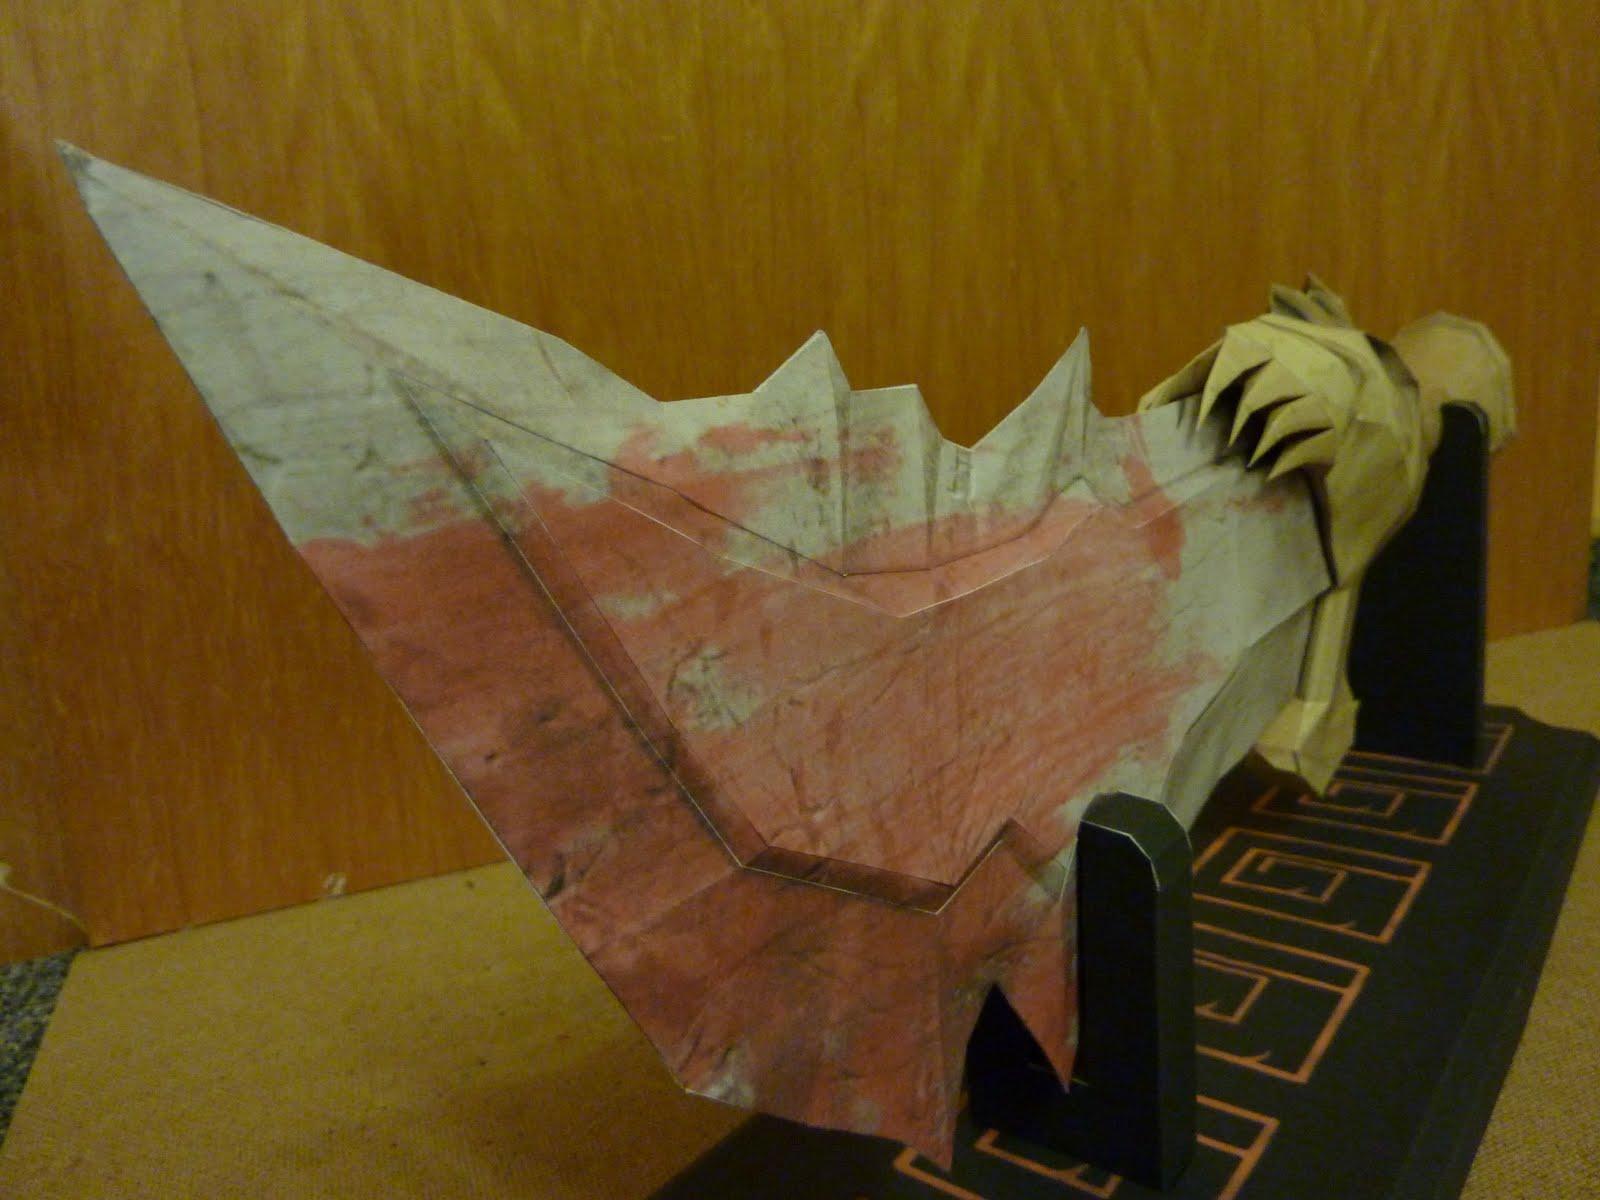 espada do kratos god of war papercraft do mal